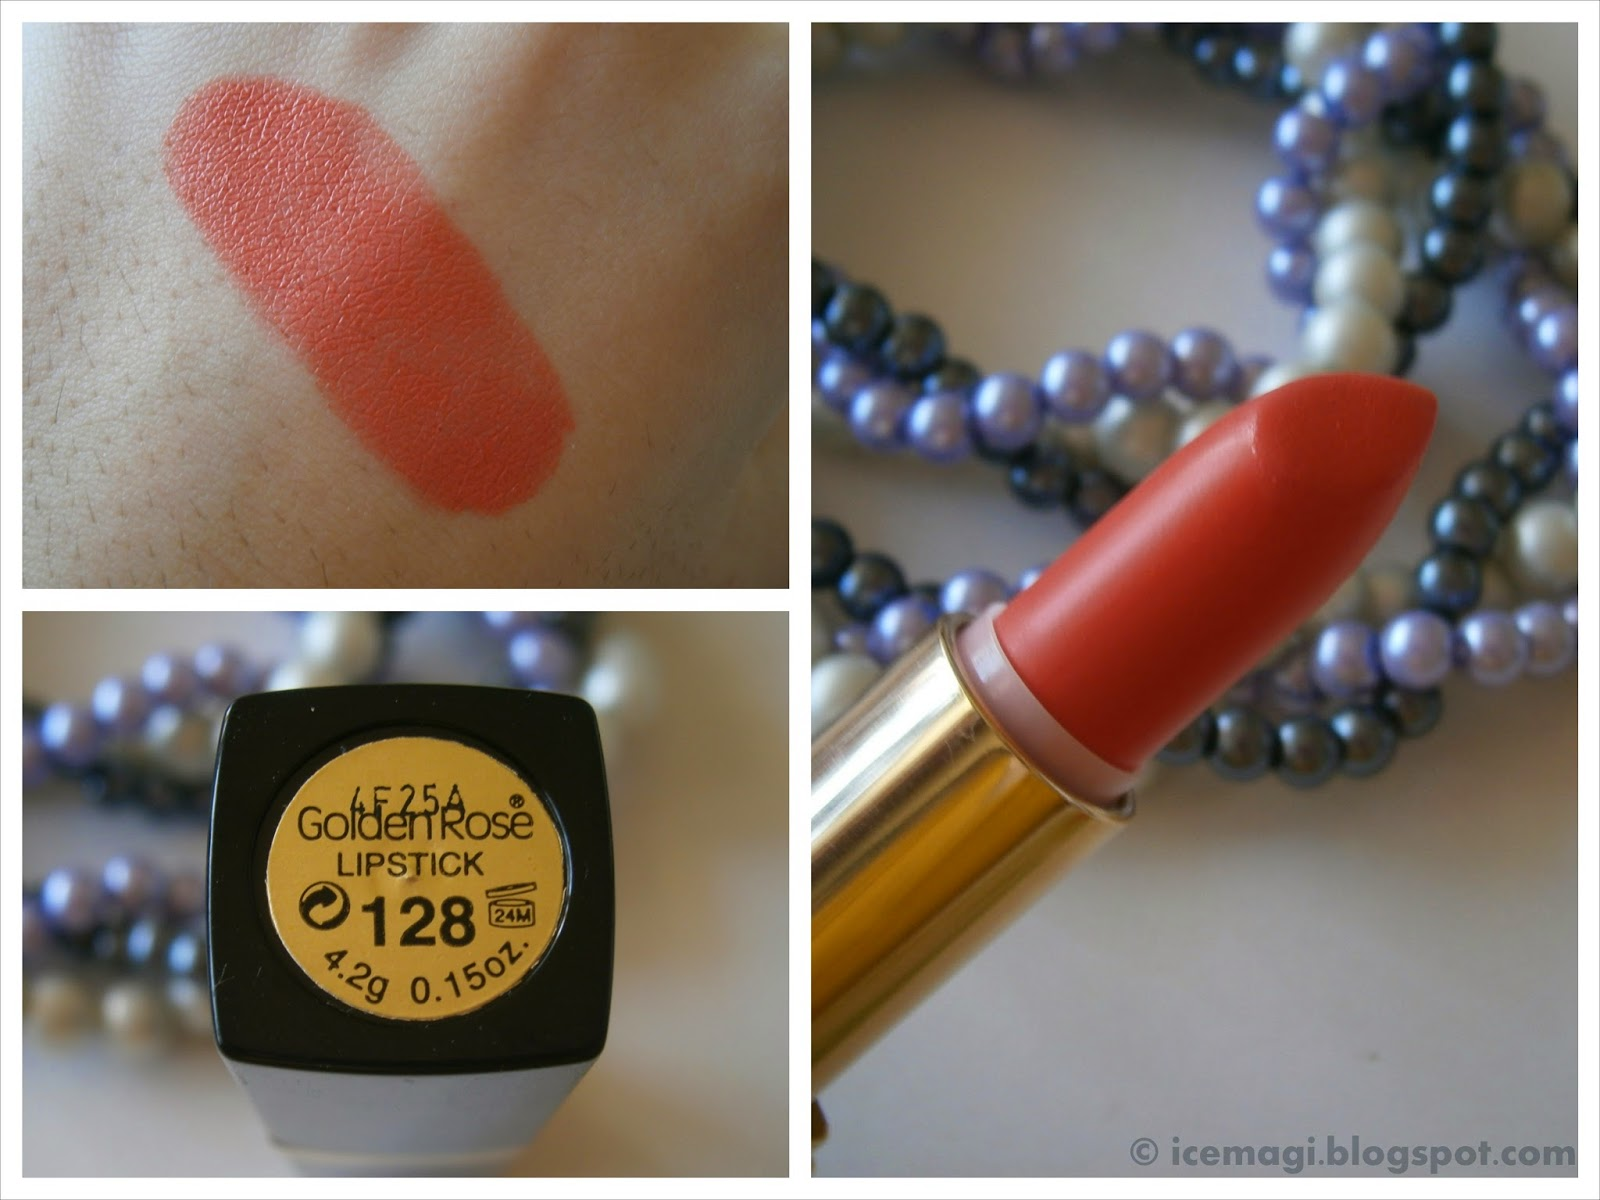 Golden Rose lipstick swatch